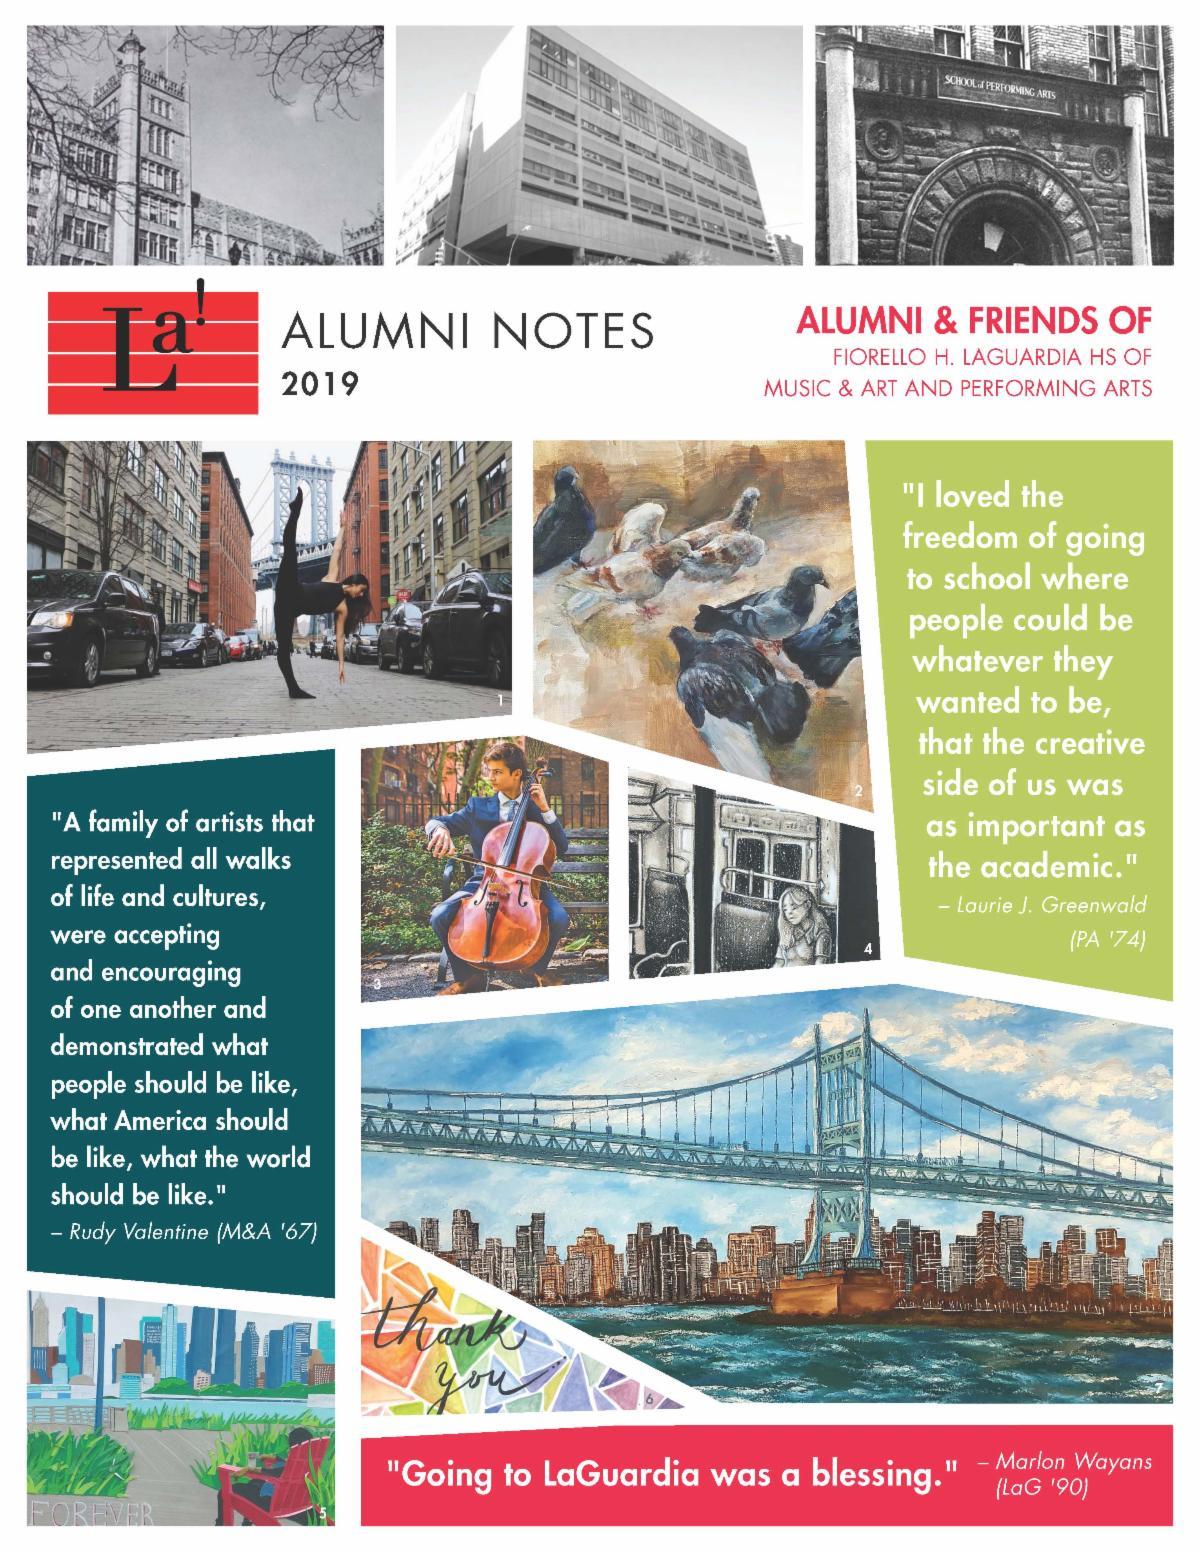 Alumni Notes 2019 from Alumni & Friends of LaGuardia High School